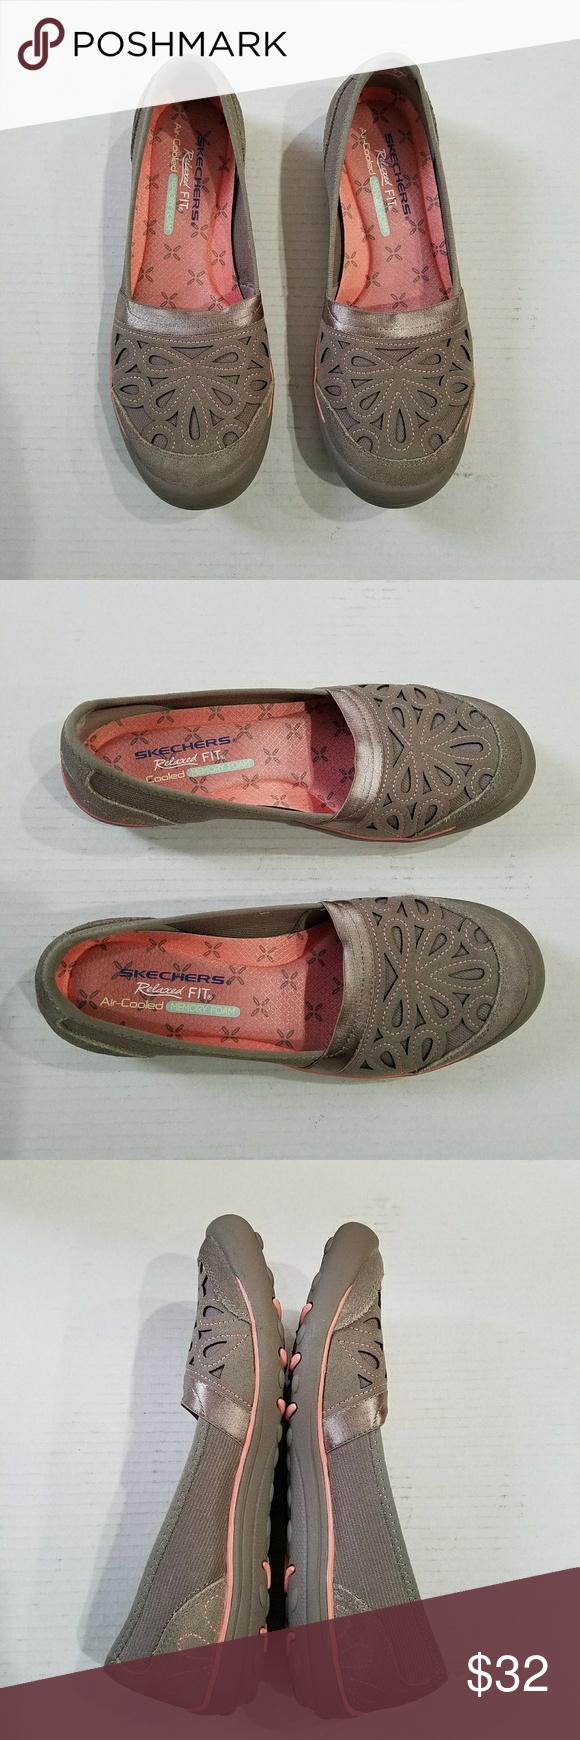 Sketchers Women's Slip On Loafers Shoes Size 7 Sketchers